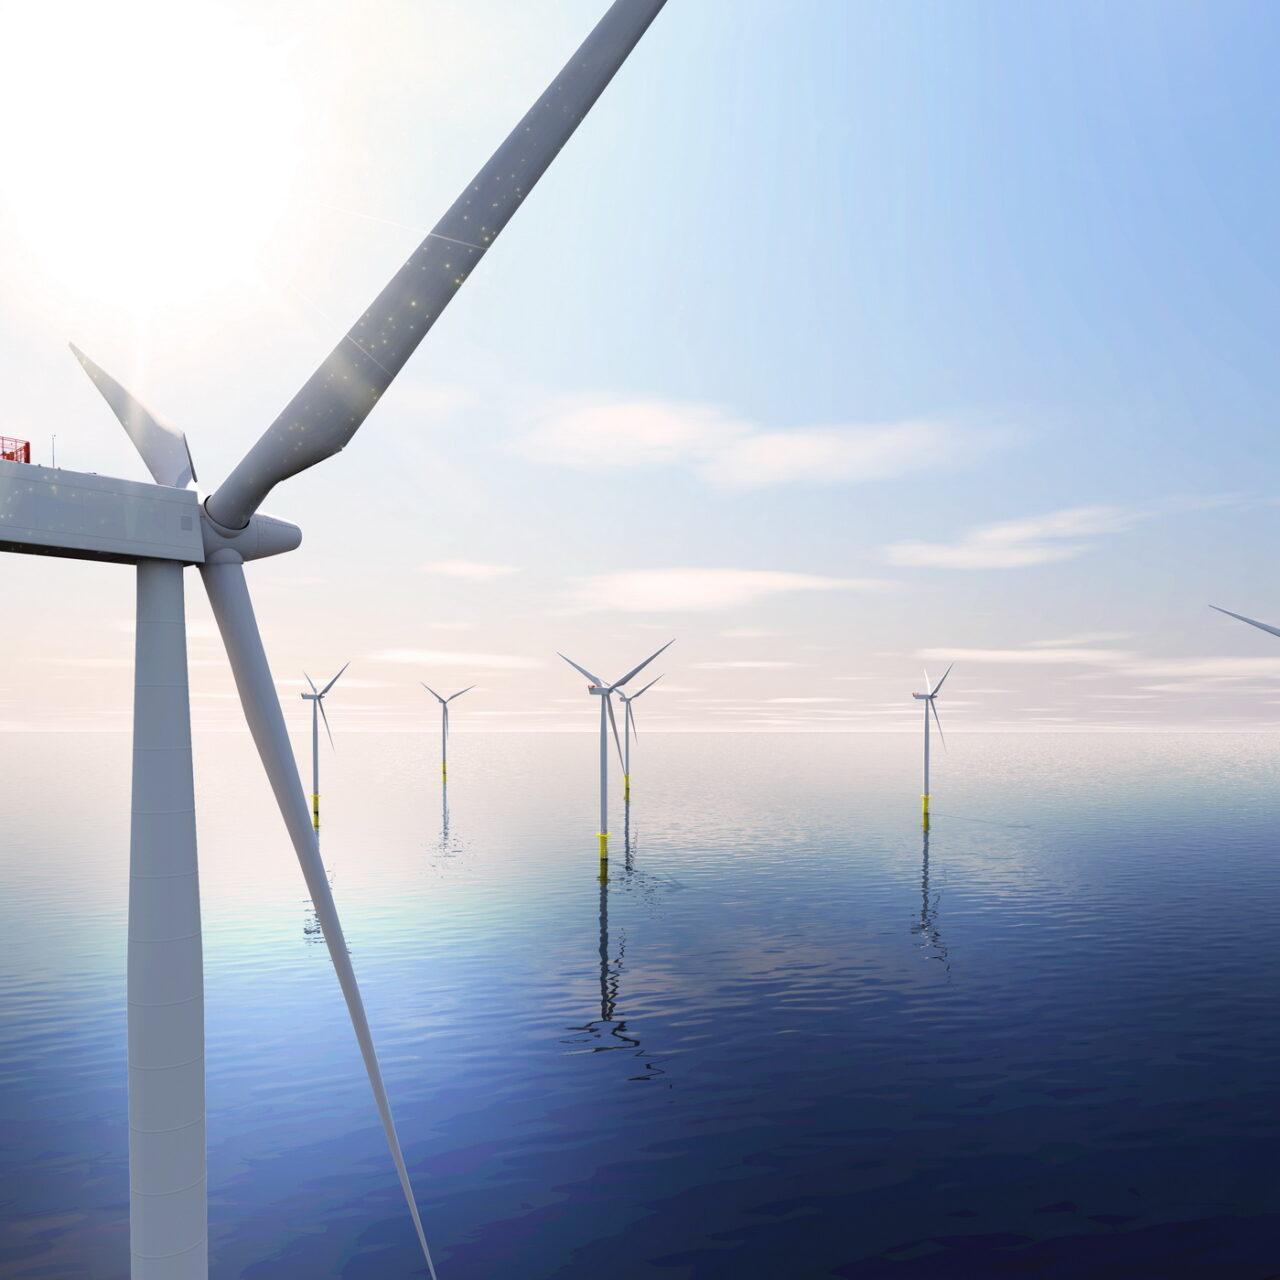 EB-SIM kooperiert mit ENERCON